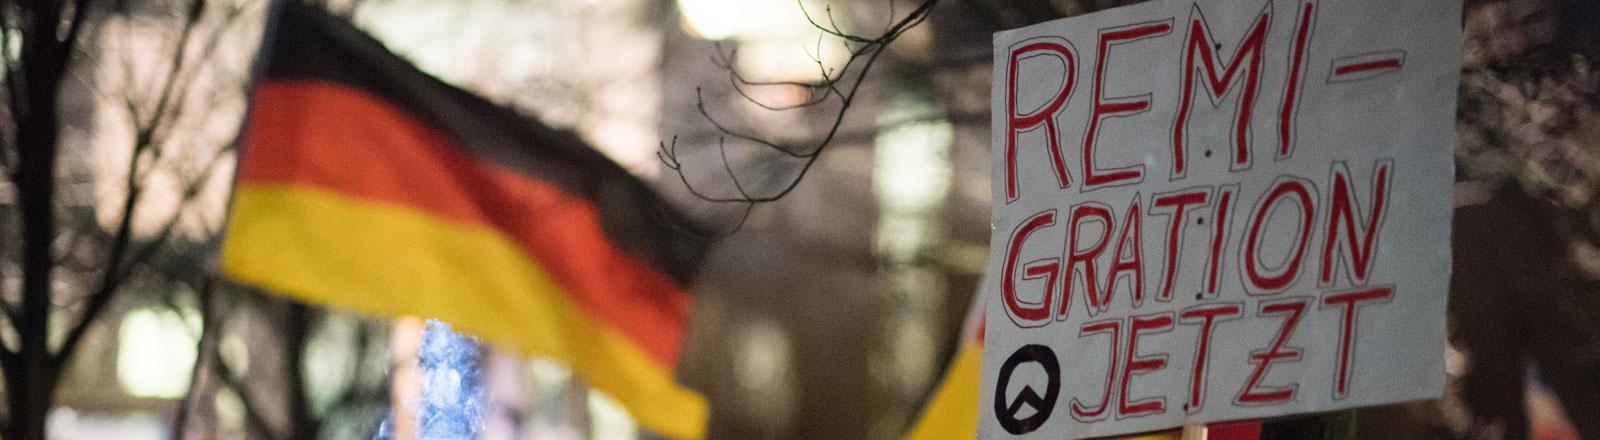 Demonstration in Berlin Remigration jetzt